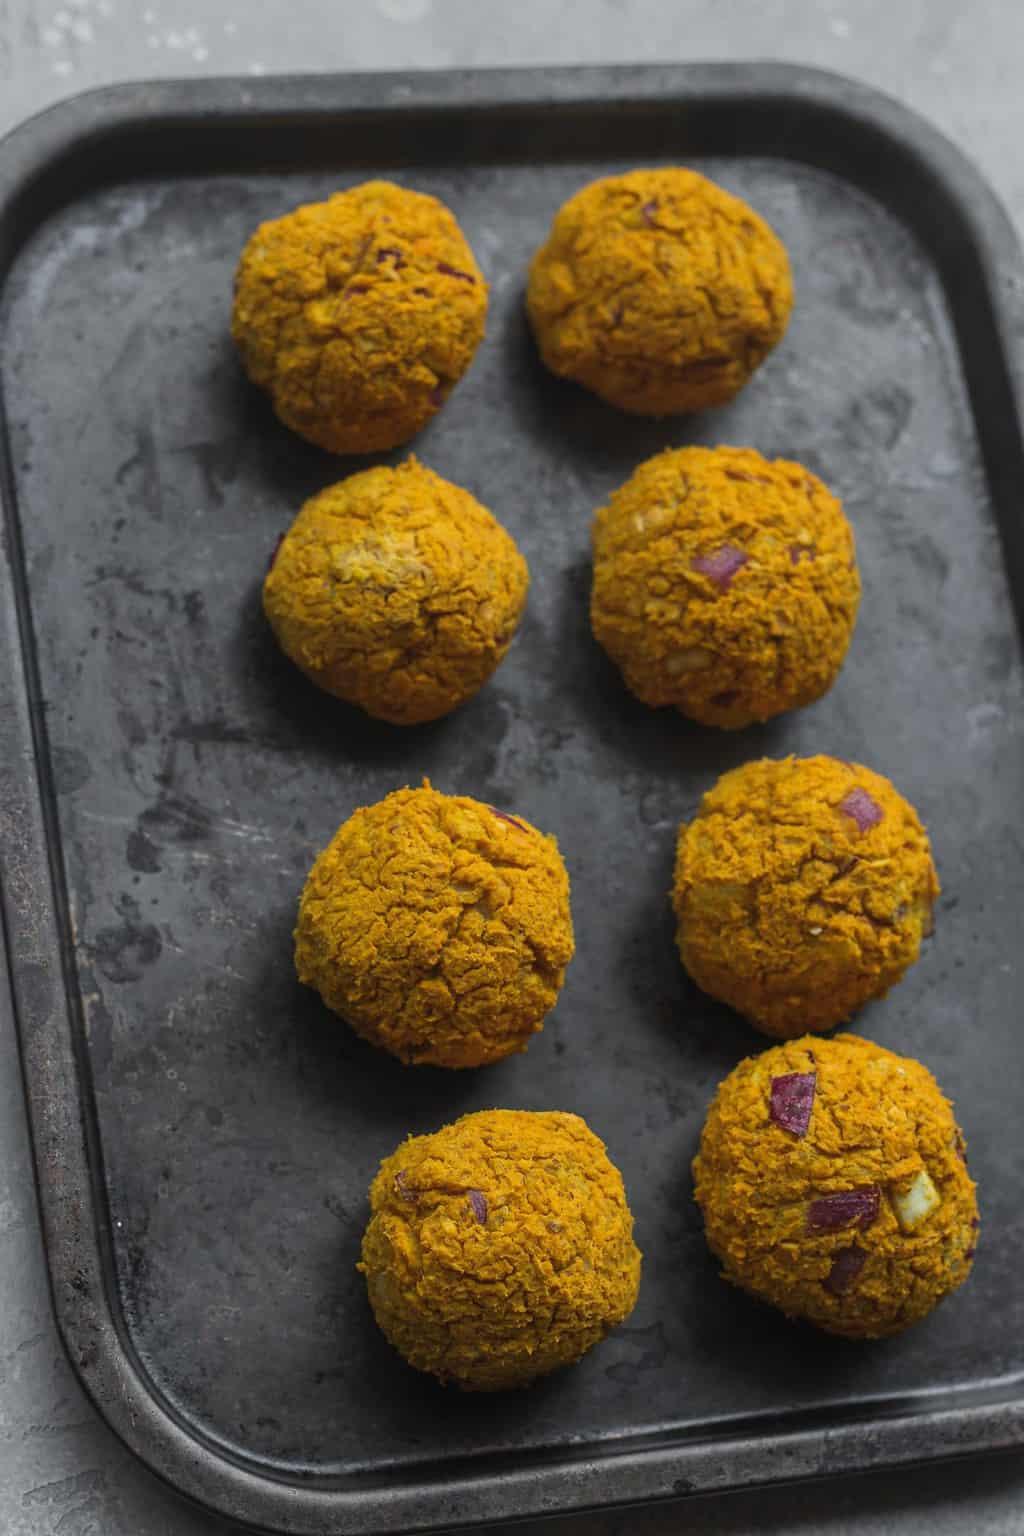 Vegan lentil meatballs on a baking sheet